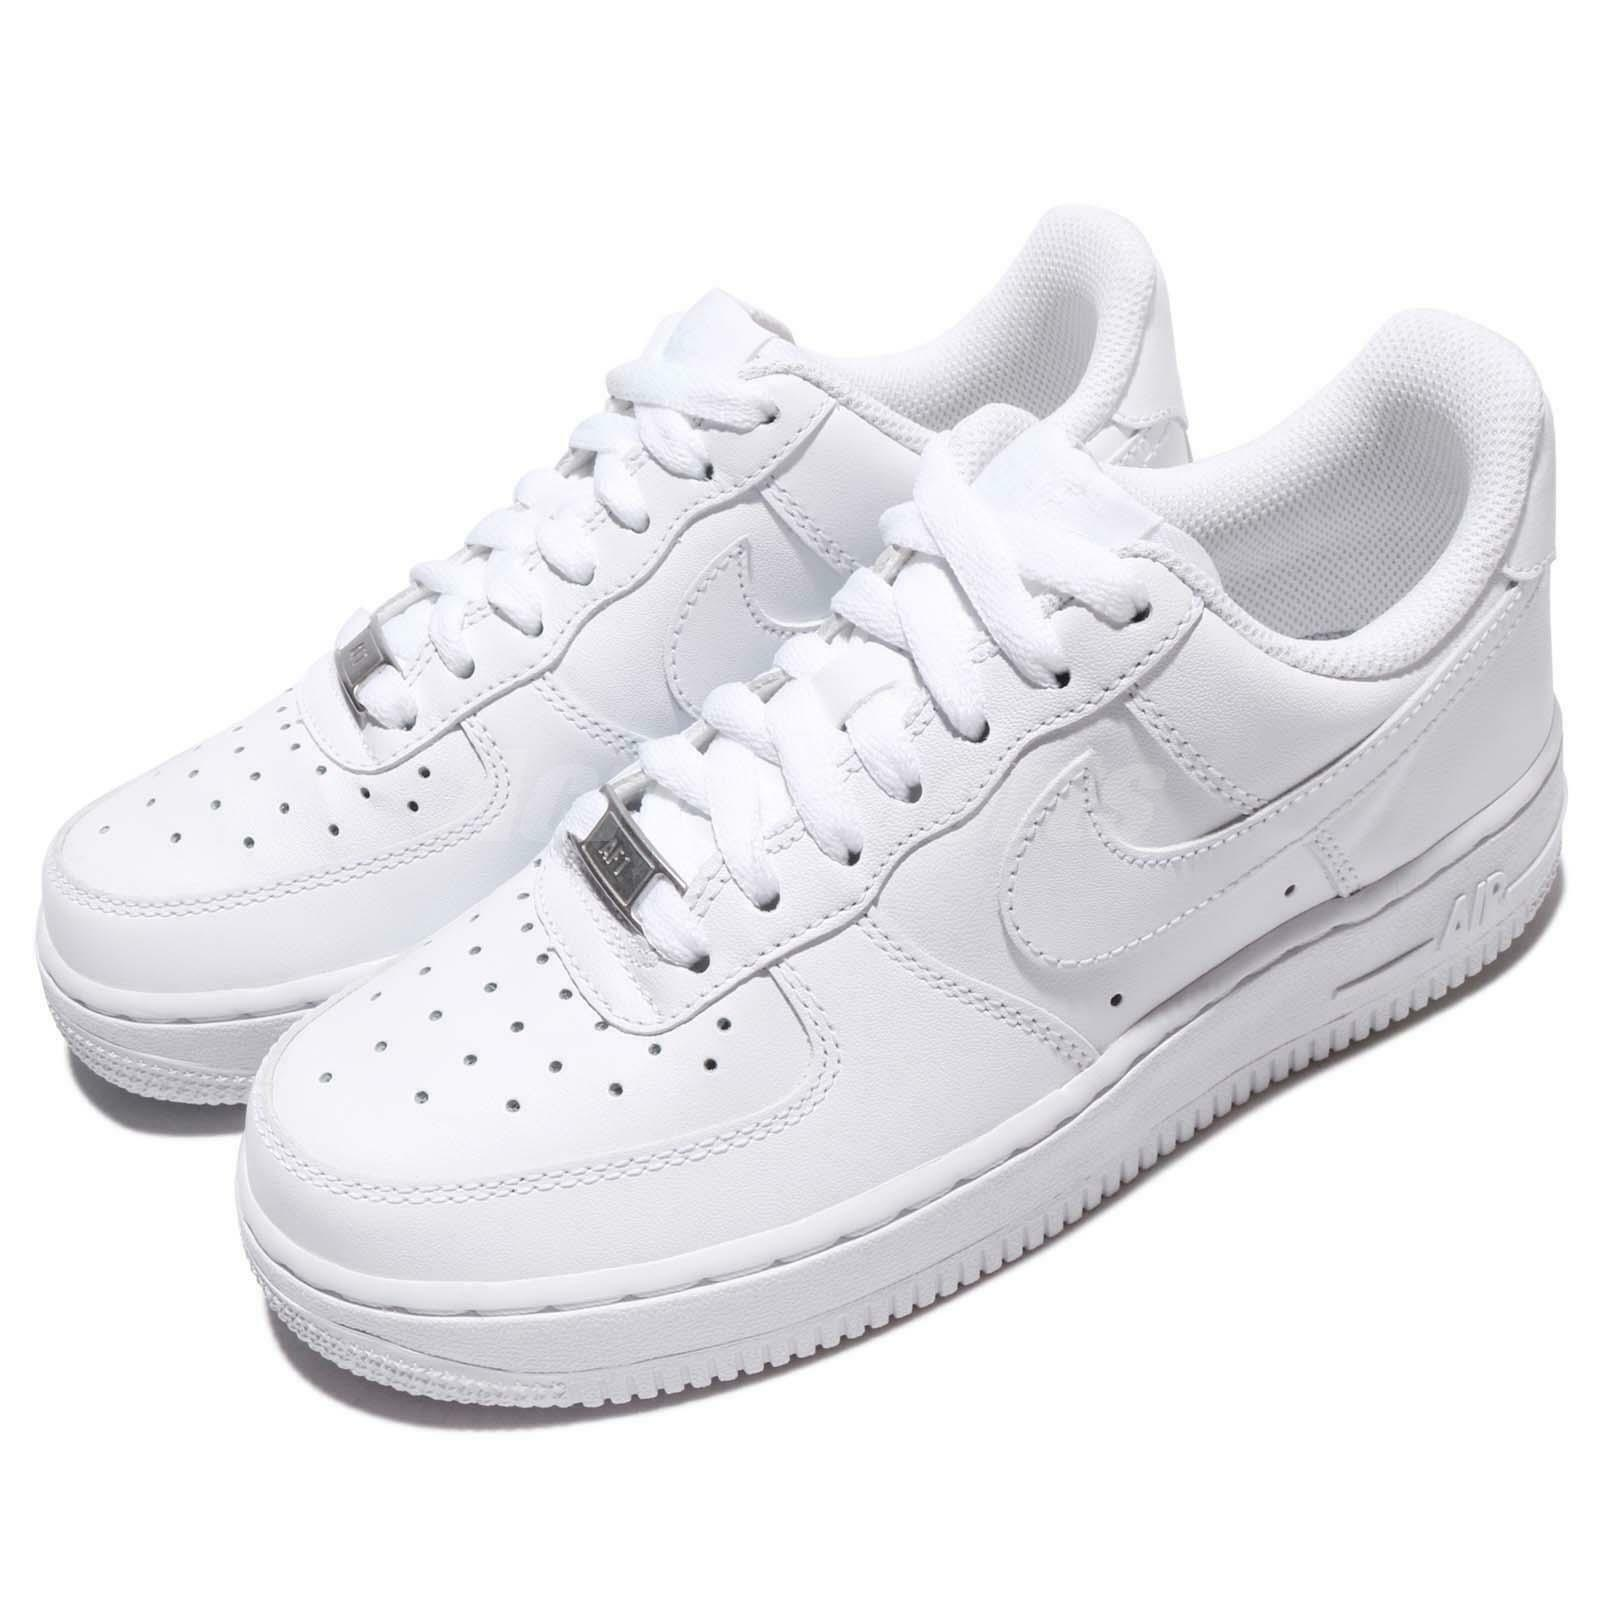 Nike Air Force 1 Women Size 8 White